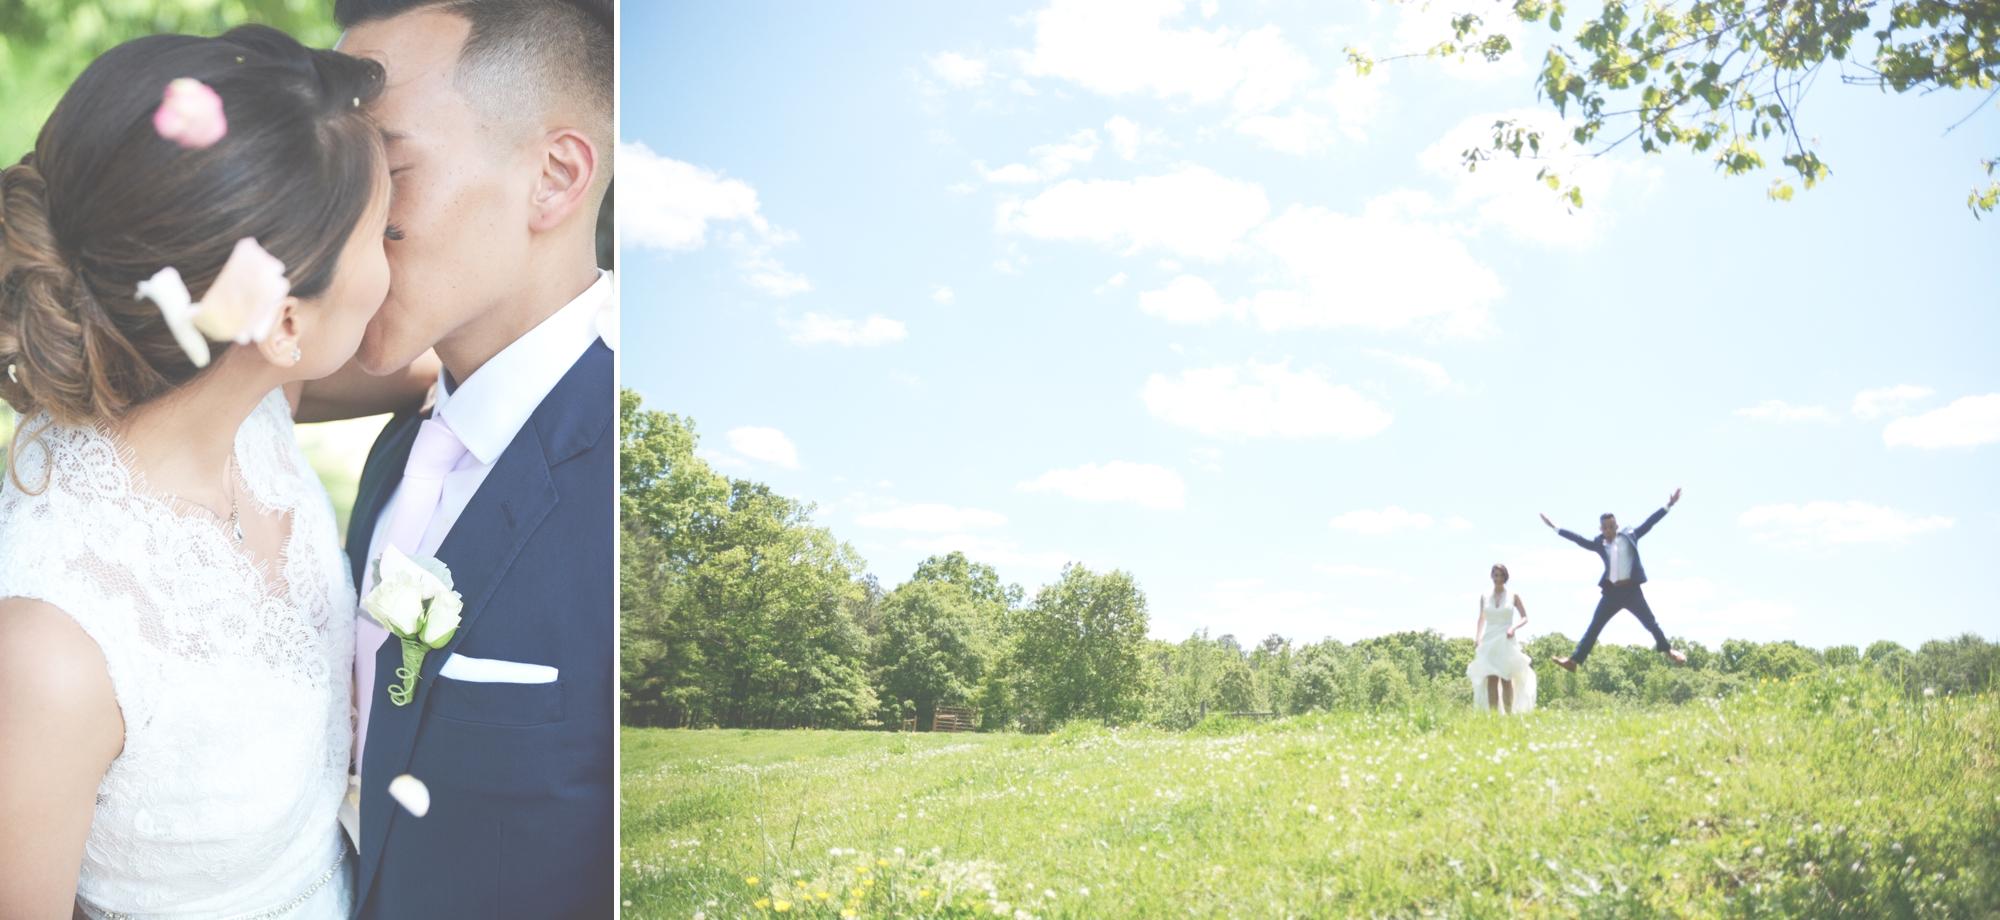 Wedding PhotoBooth - The Wright Farm - RobotBooth 2